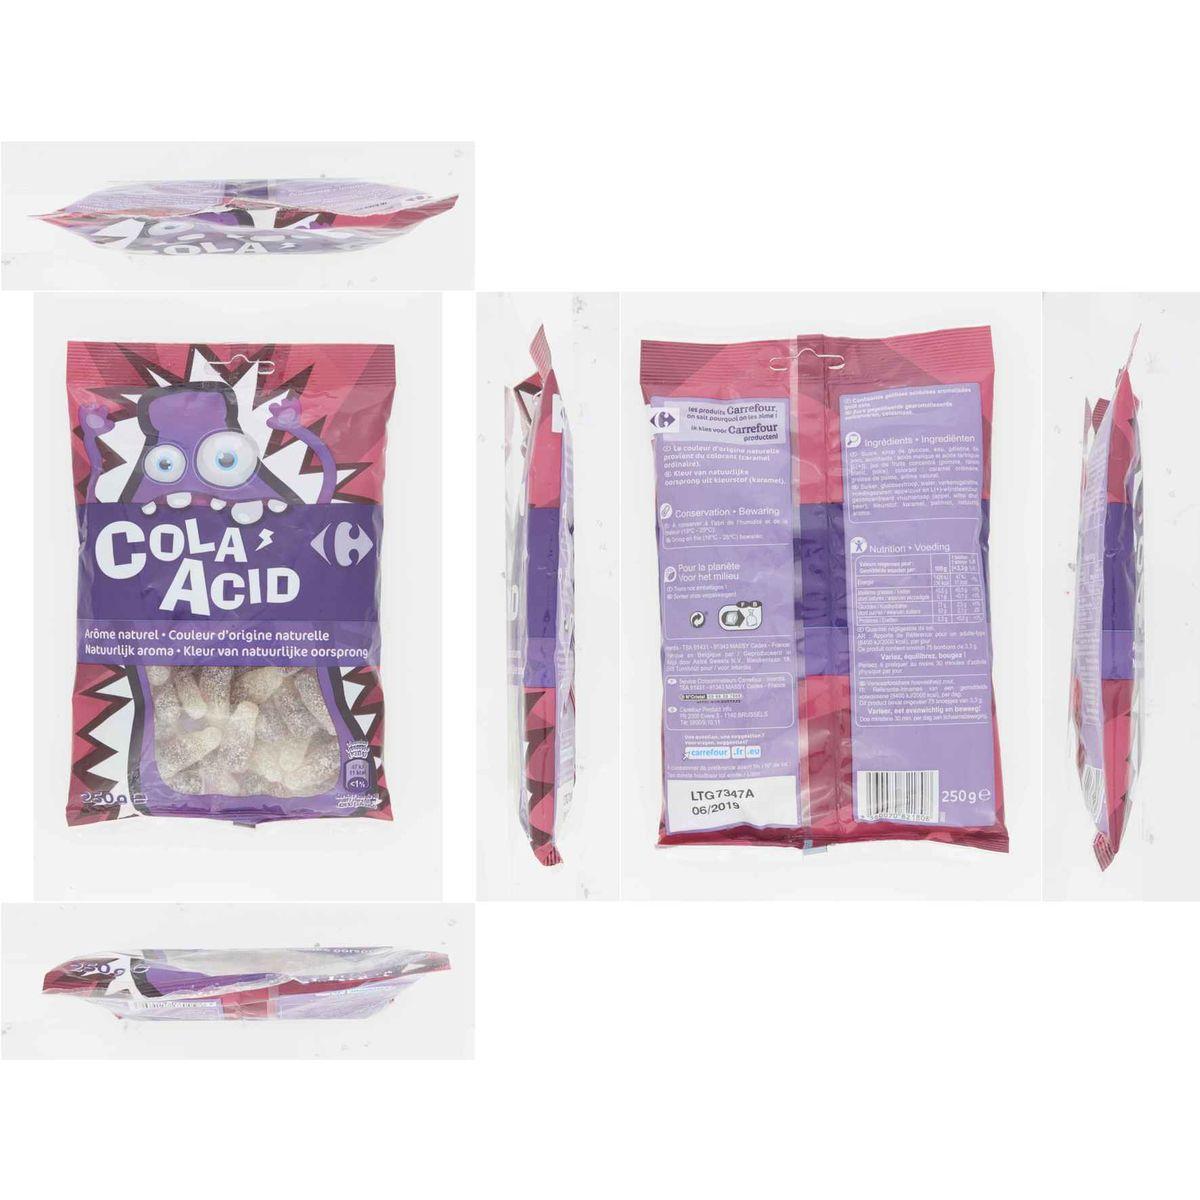 Carrefour Cola Acid 250 g